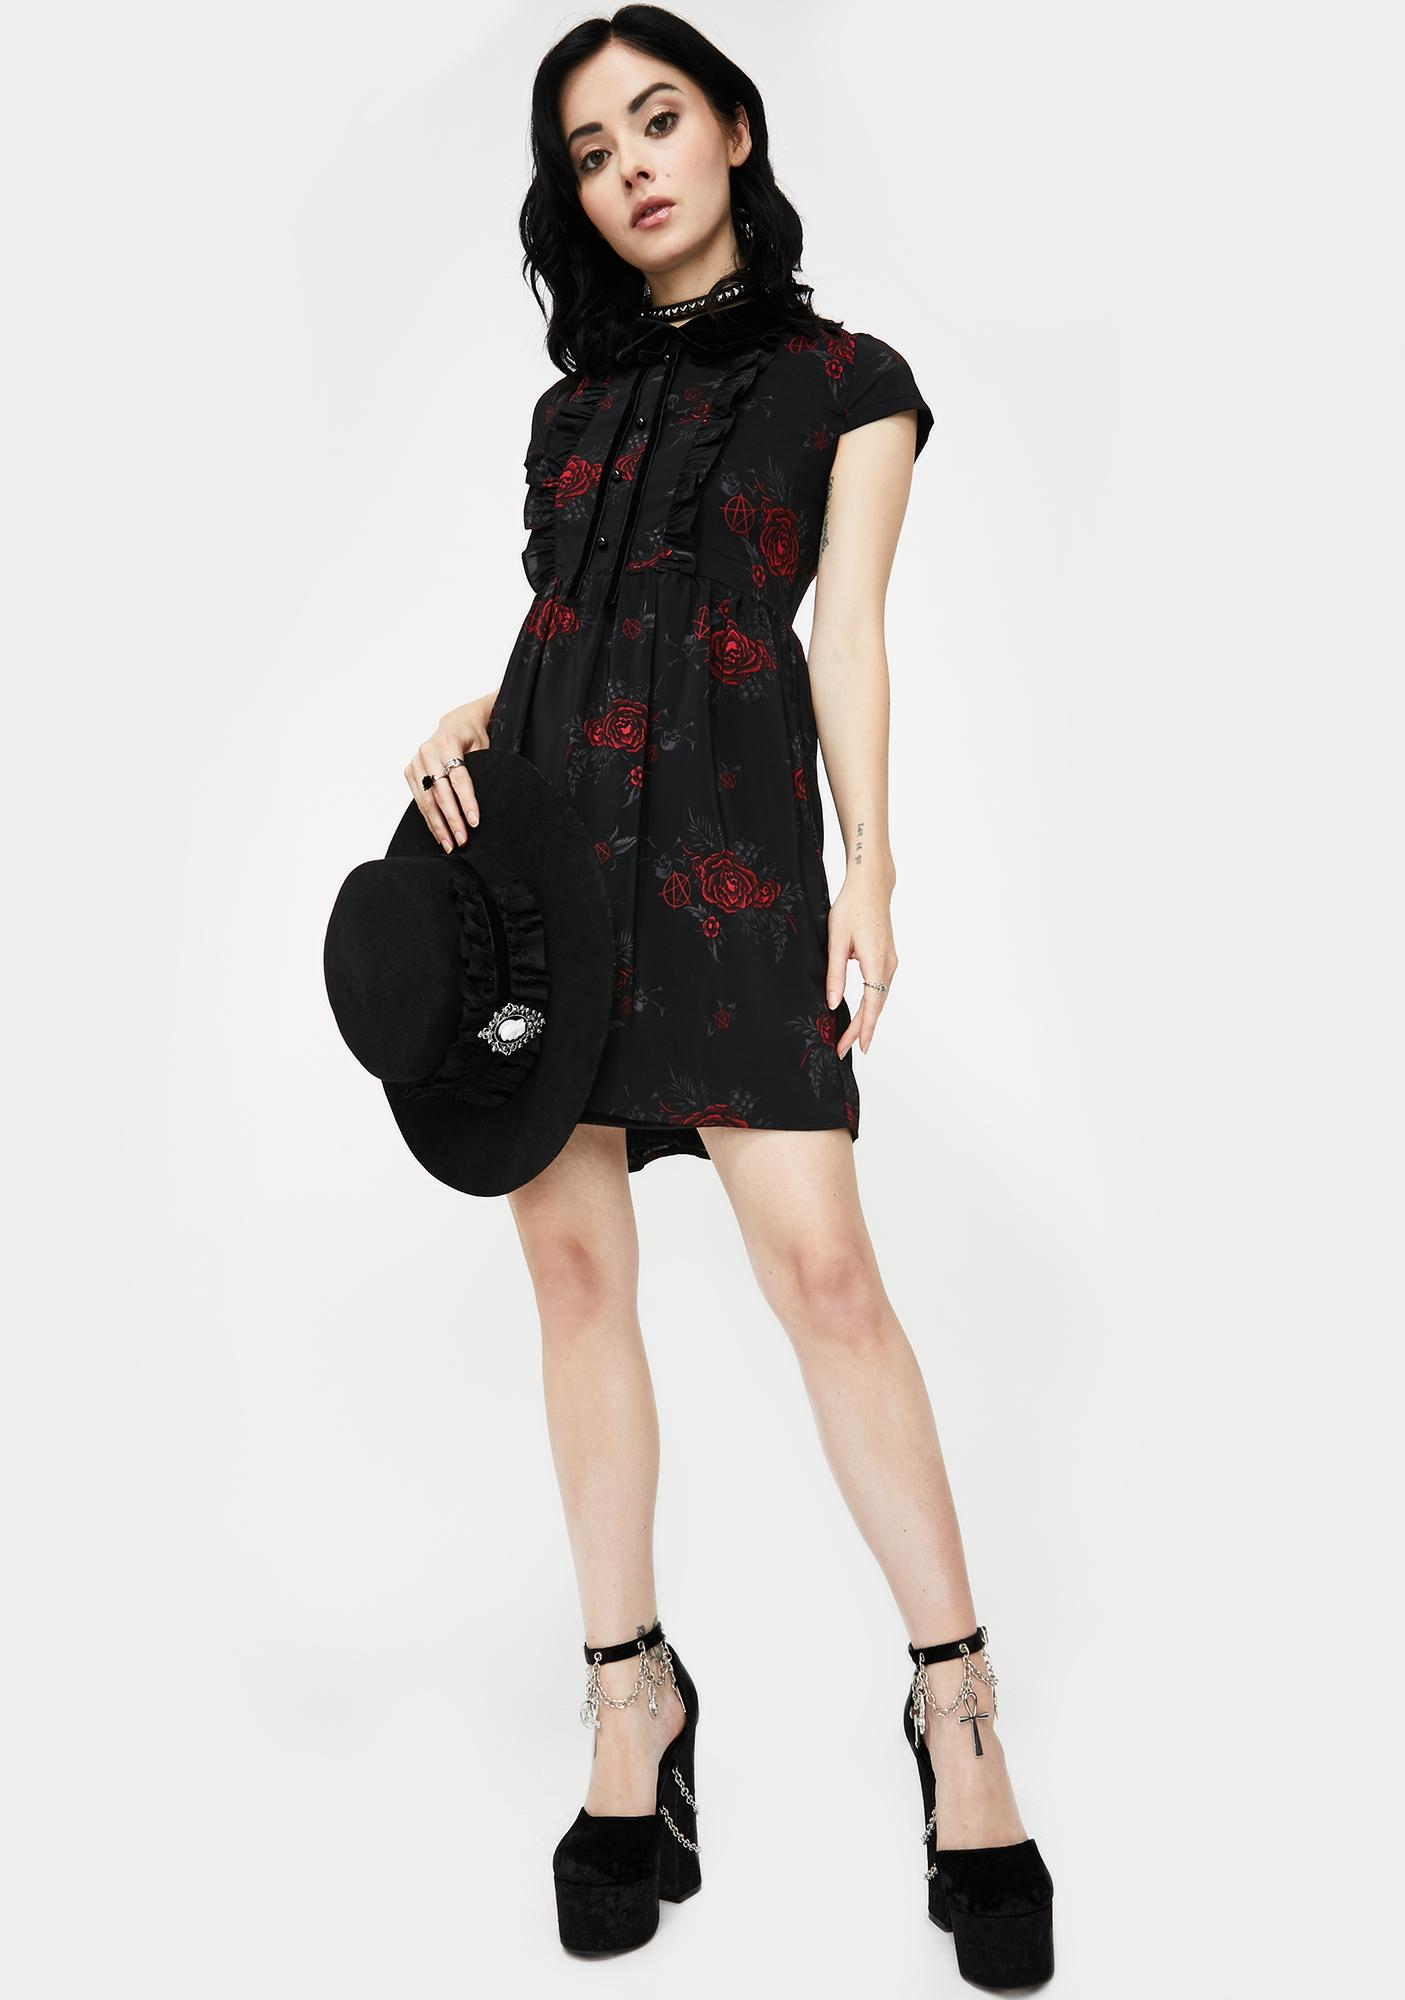 Killstar Rosalia Doll Dress